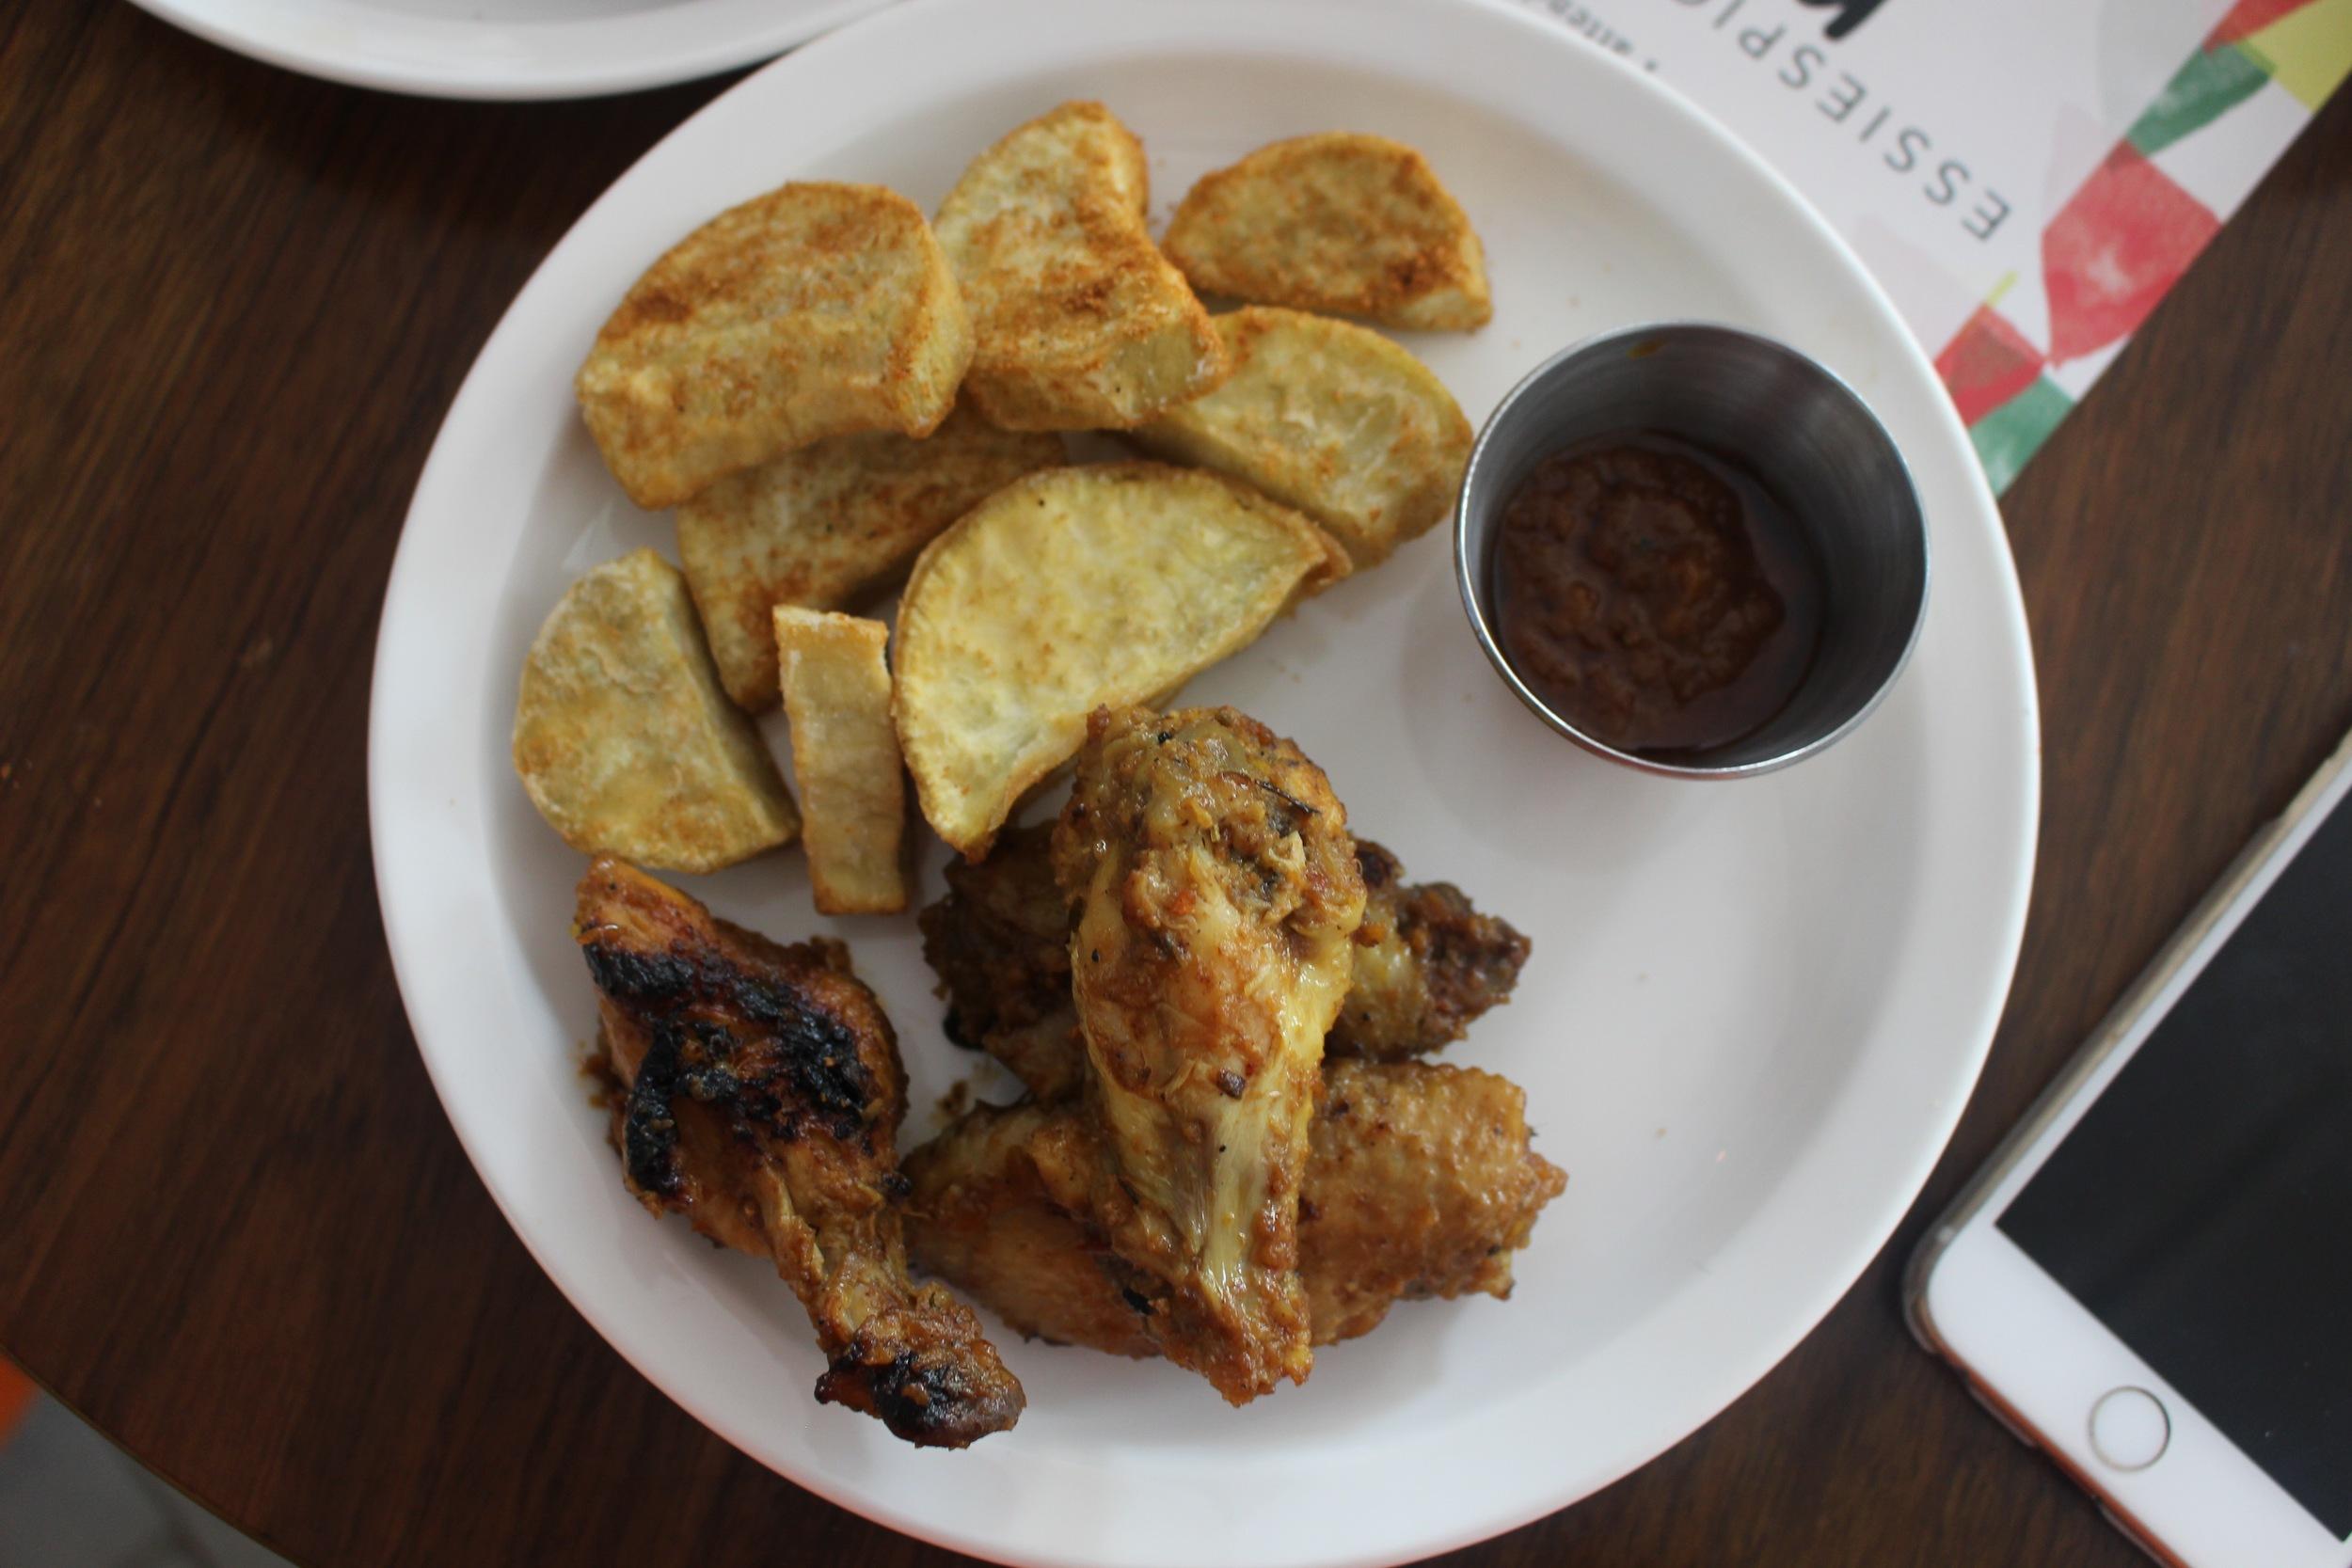 Coco for garlic, served with meko dry rub sweet potatoes